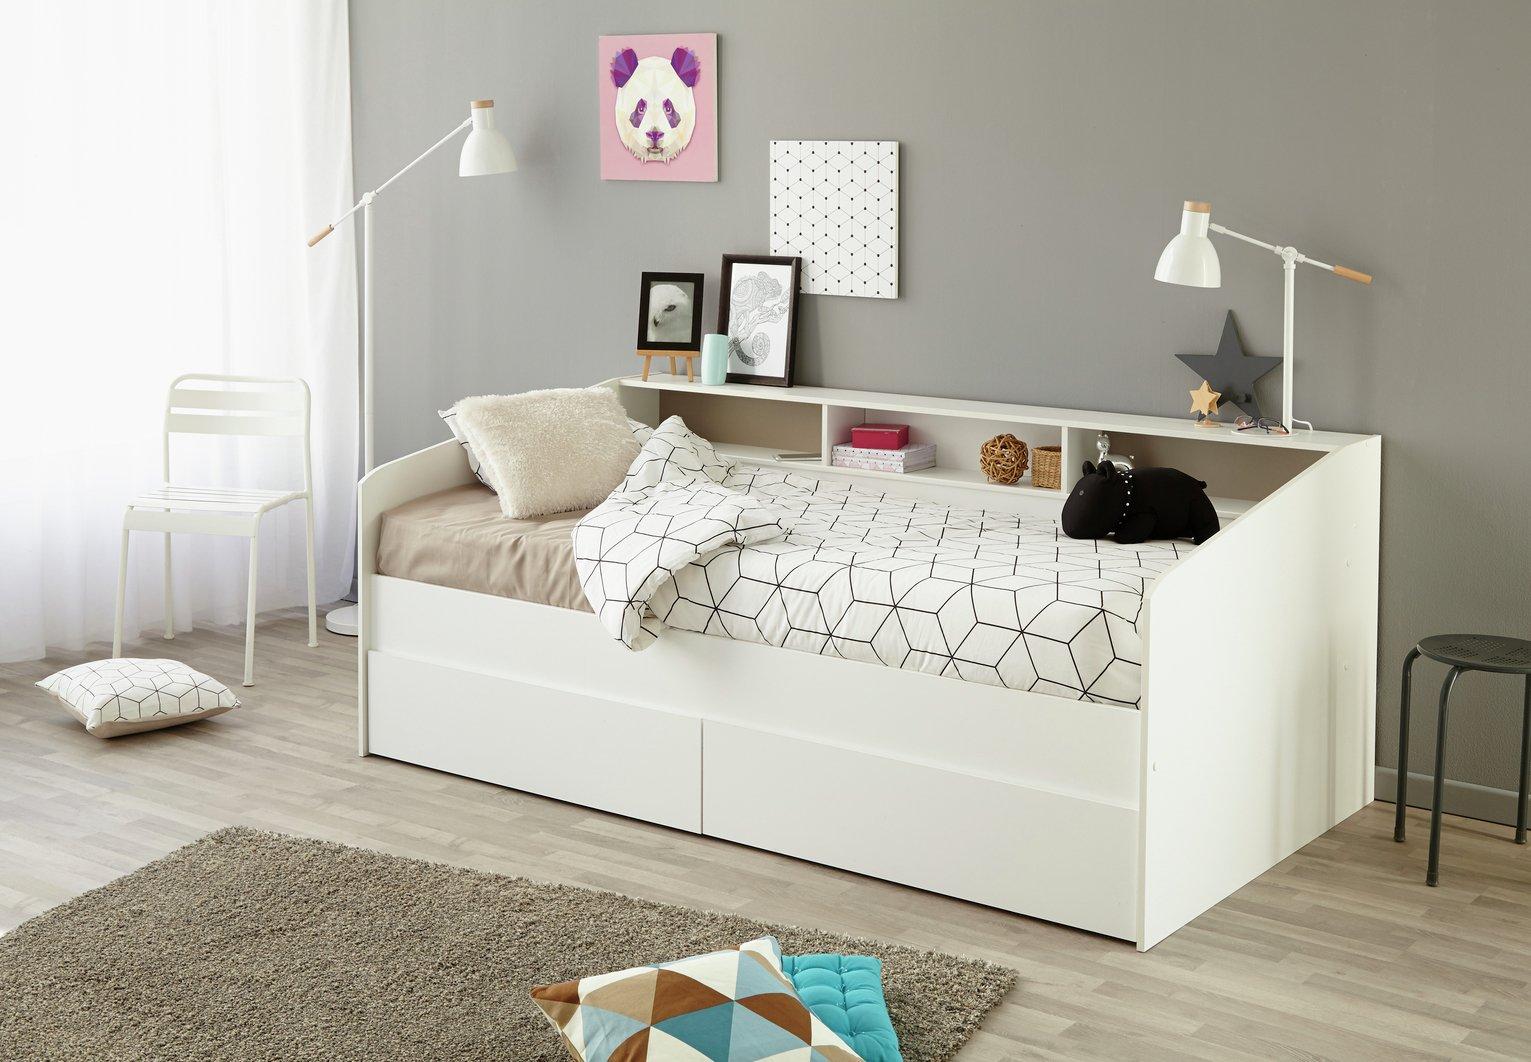 Parisot Sleep White Day Bed Frame